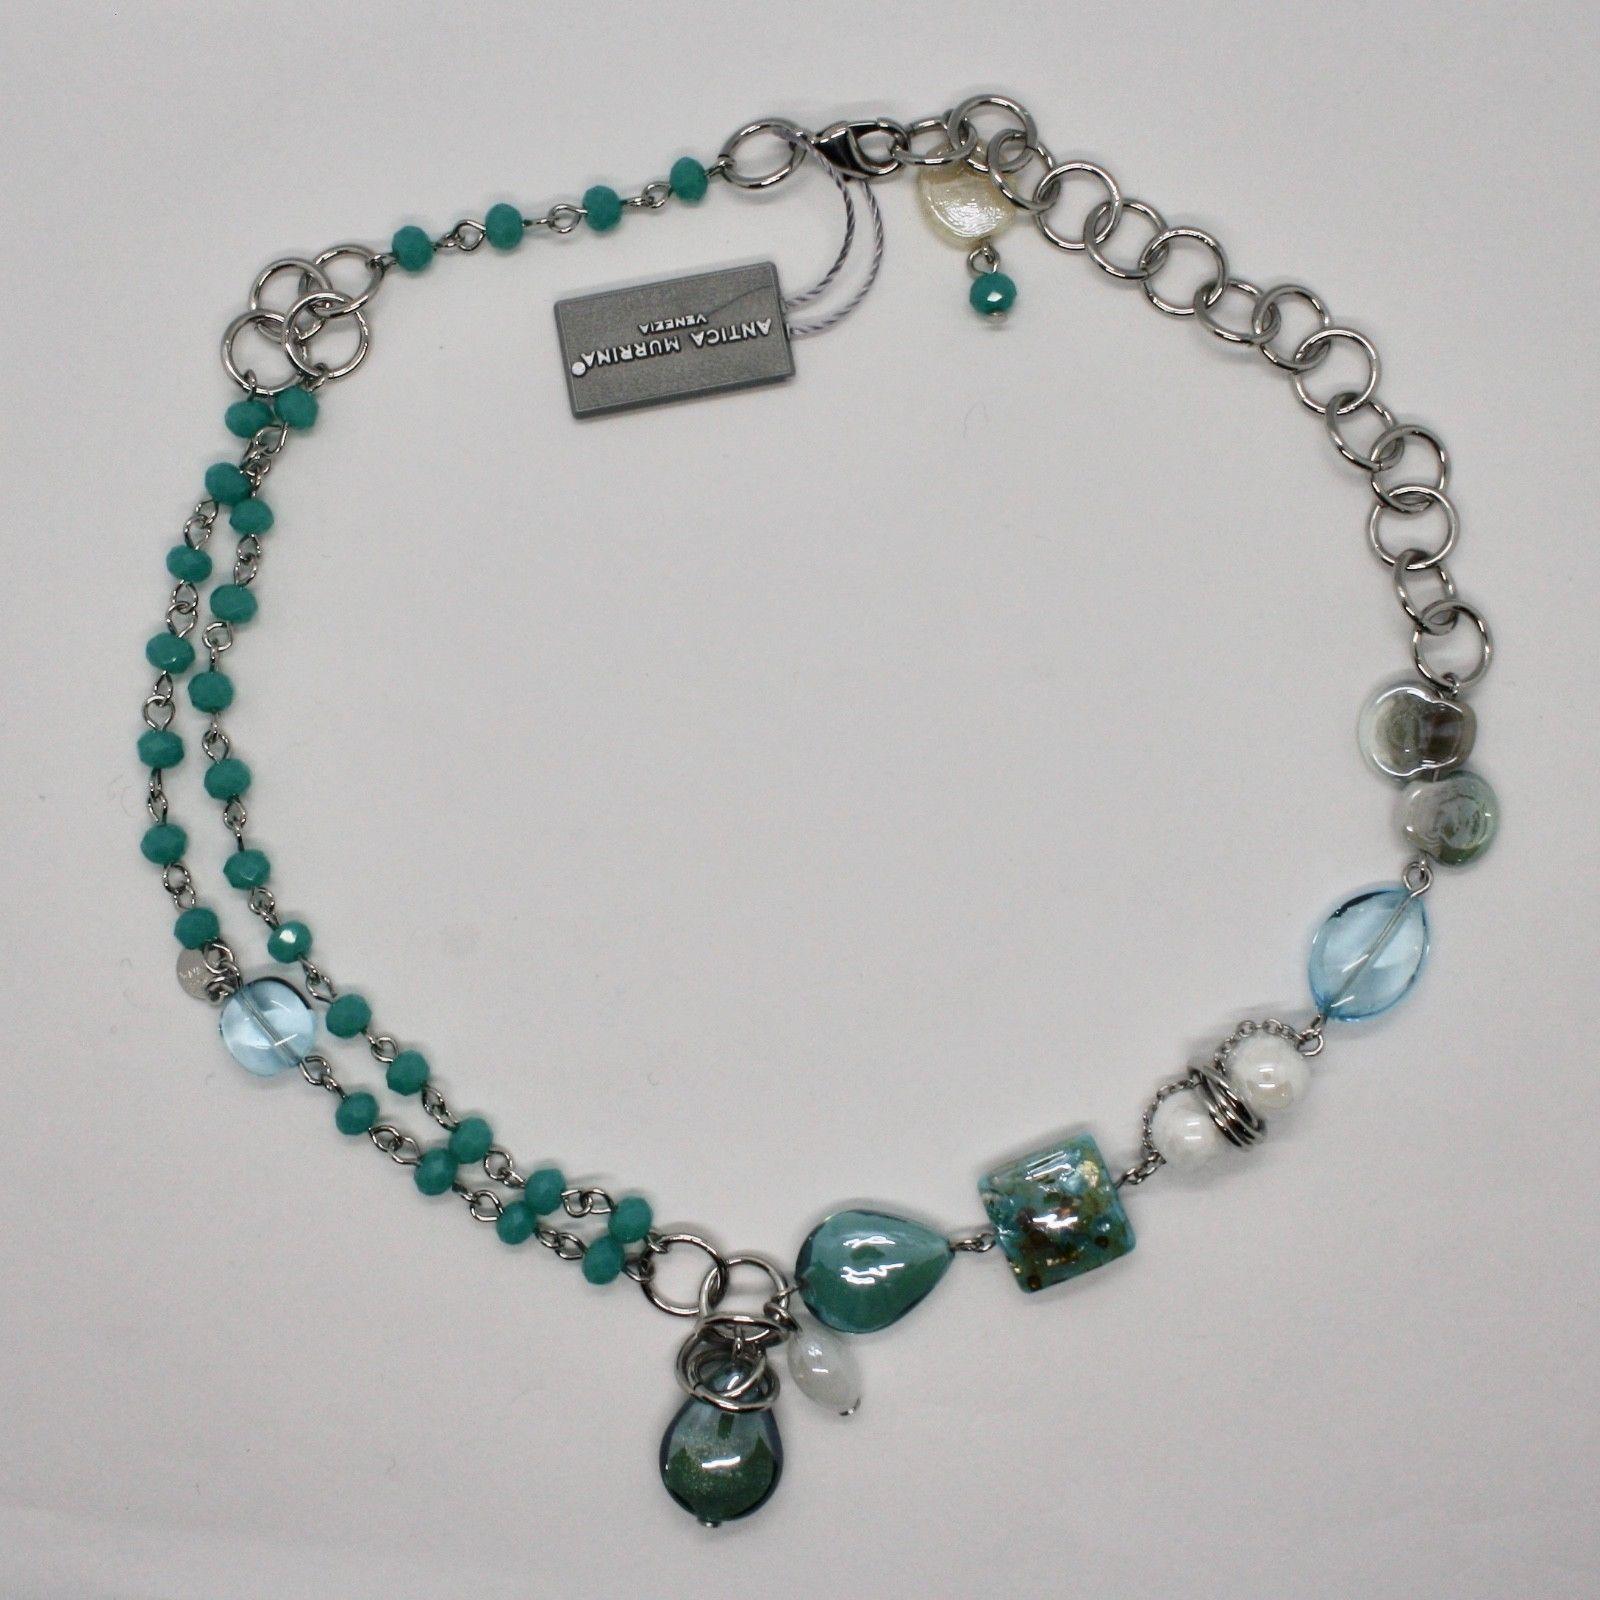 HALSKETTE ANTICA MURRINA VENEZIA MIT MURANO-GLAS TÜRKIS BLAU BEIGE COA80A07